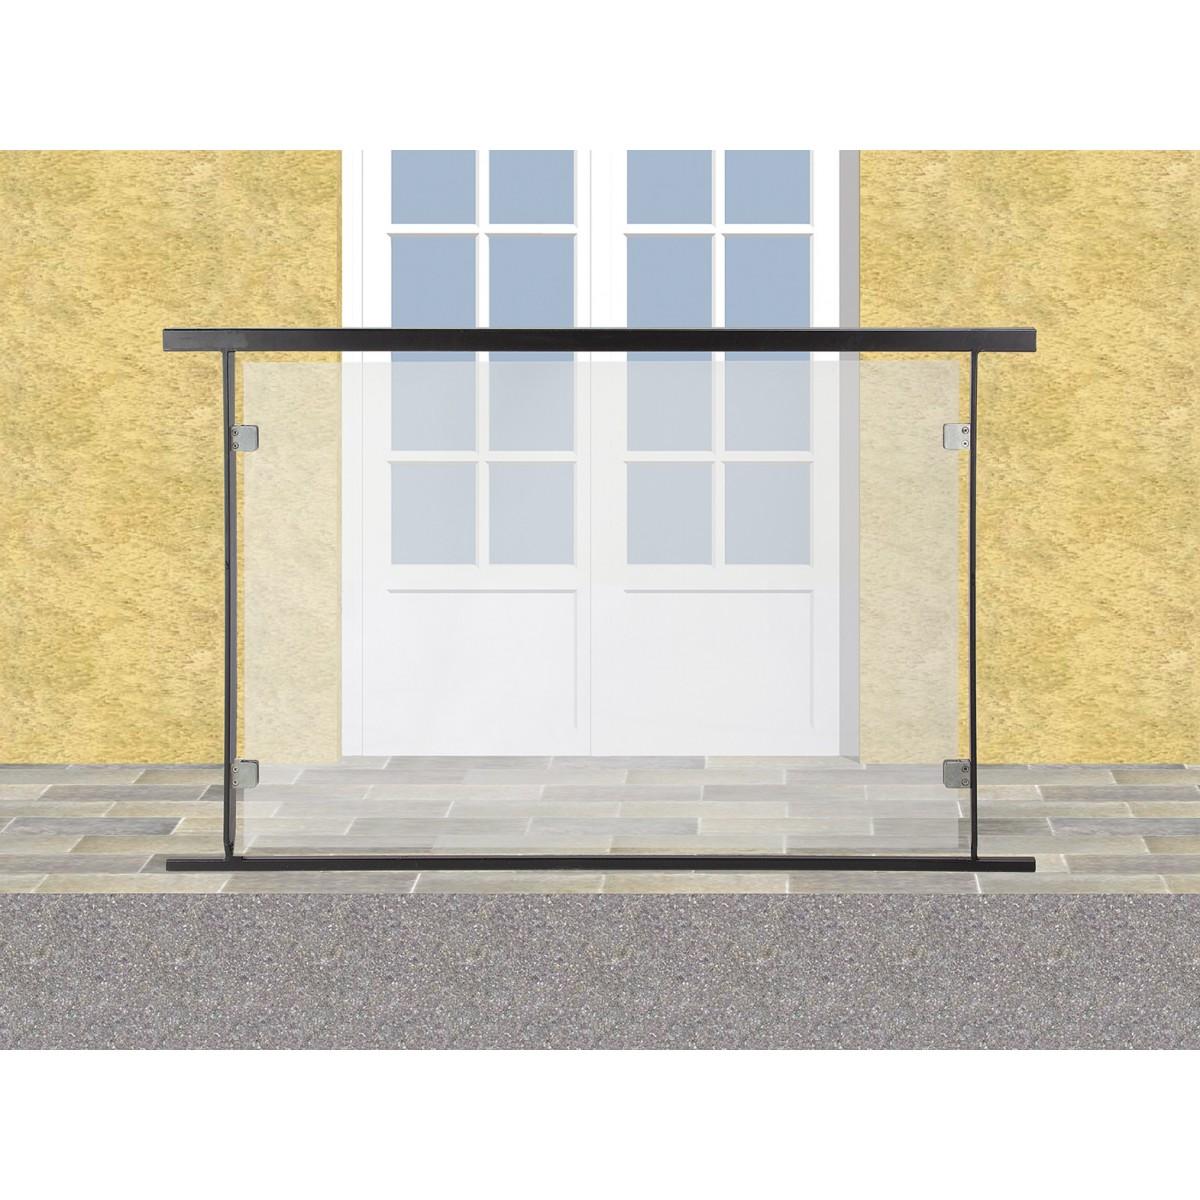 balcon en fer forg g rald balcons et terrasses. Black Bedroom Furniture Sets. Home Design Ideas